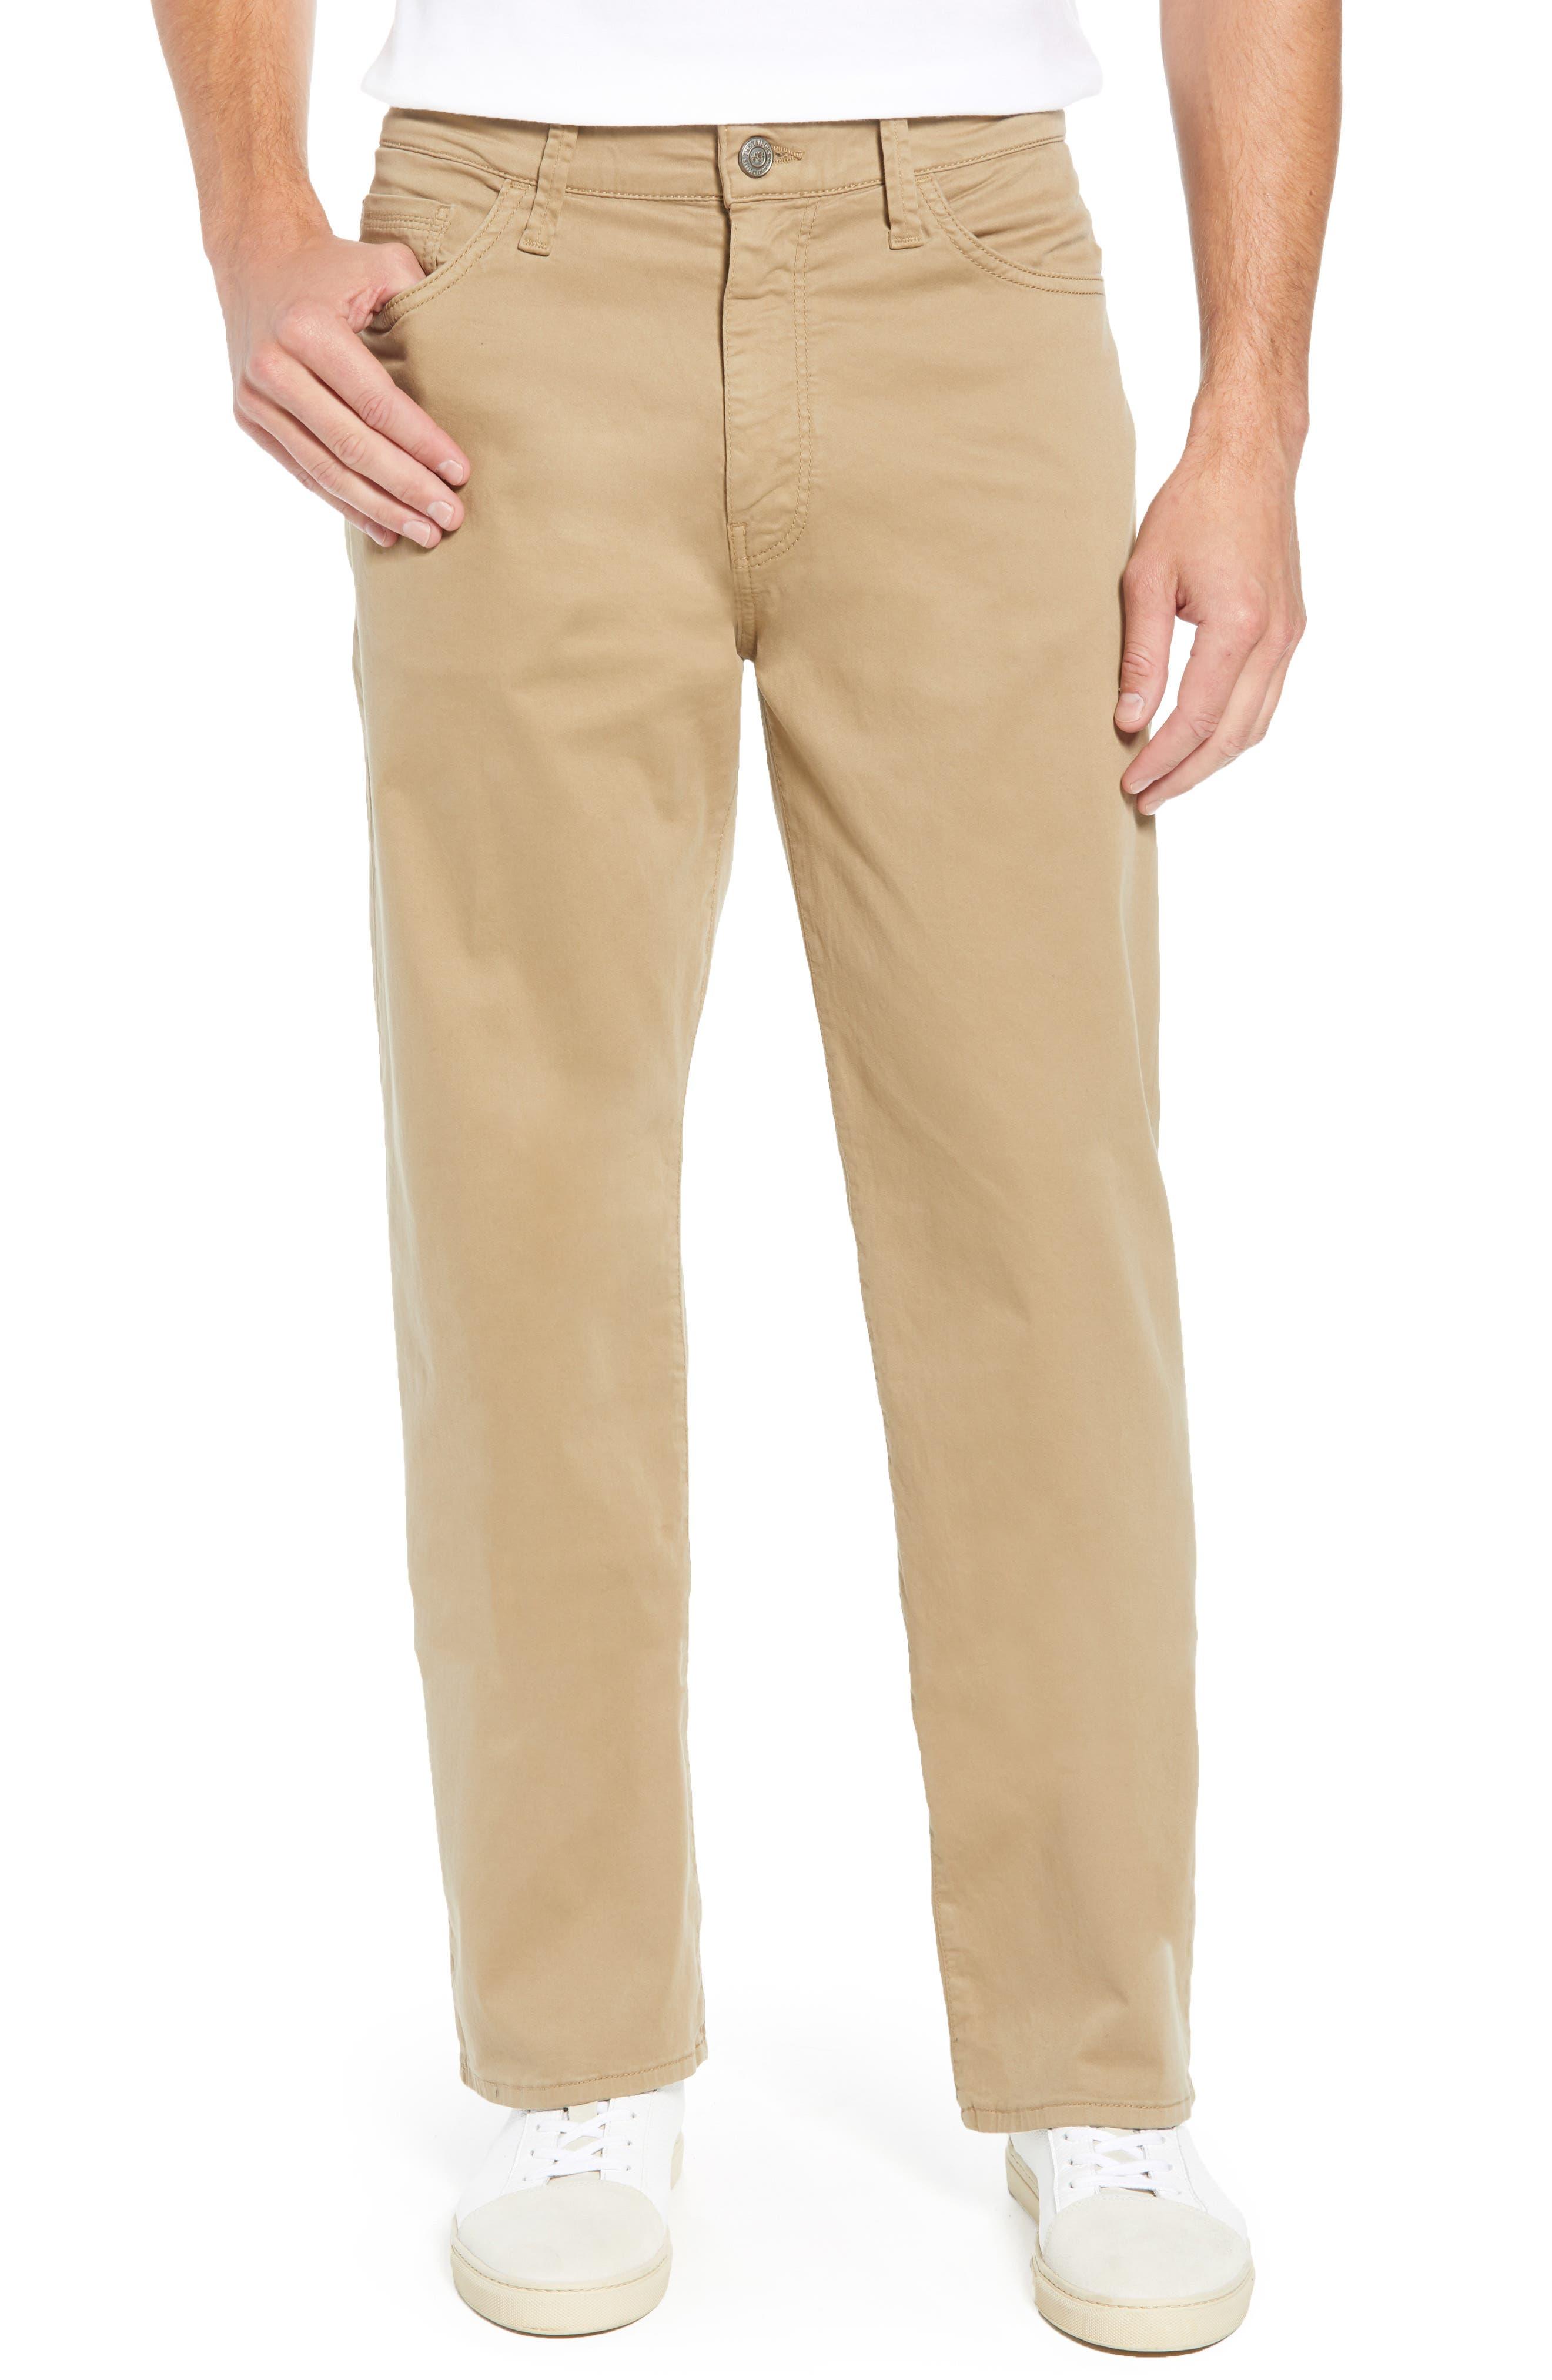 Mavi Max Relaxed Fit Twill Pants,                         Main,                         color, BRITISH KHAKI TWILL